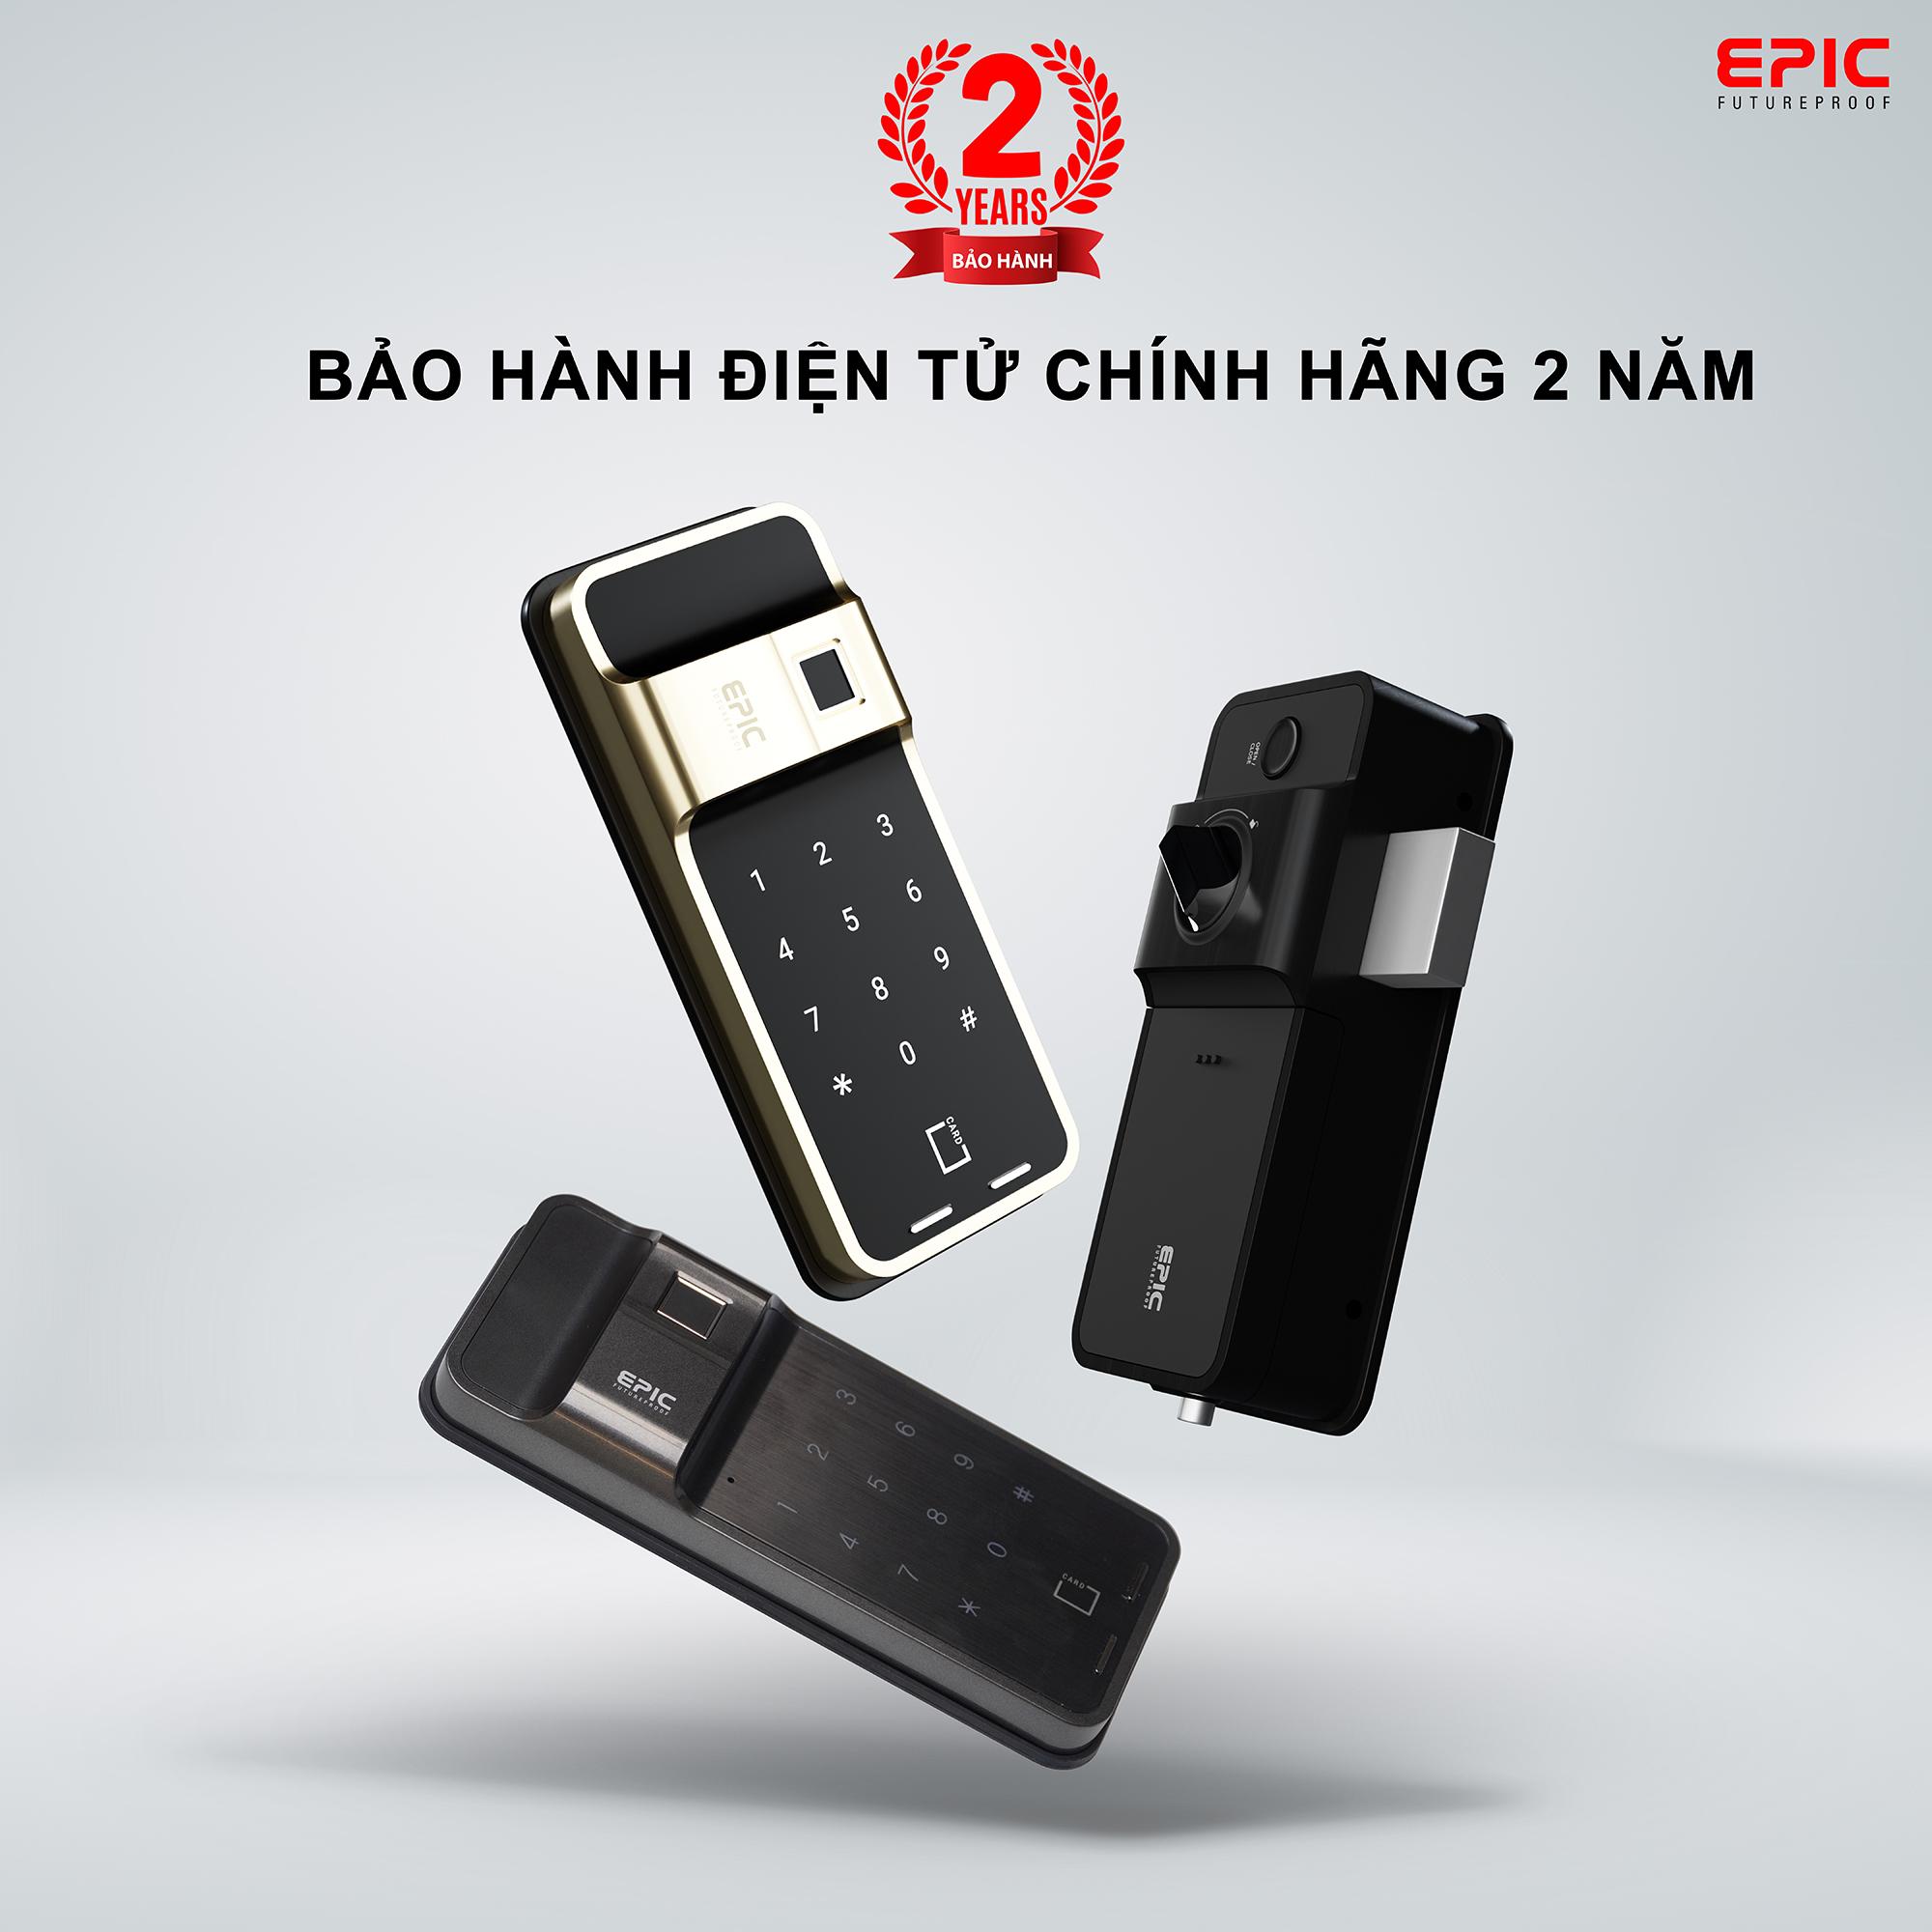 khoa-dien-tu-epic-bao-hanh-dien-tu-2-nam